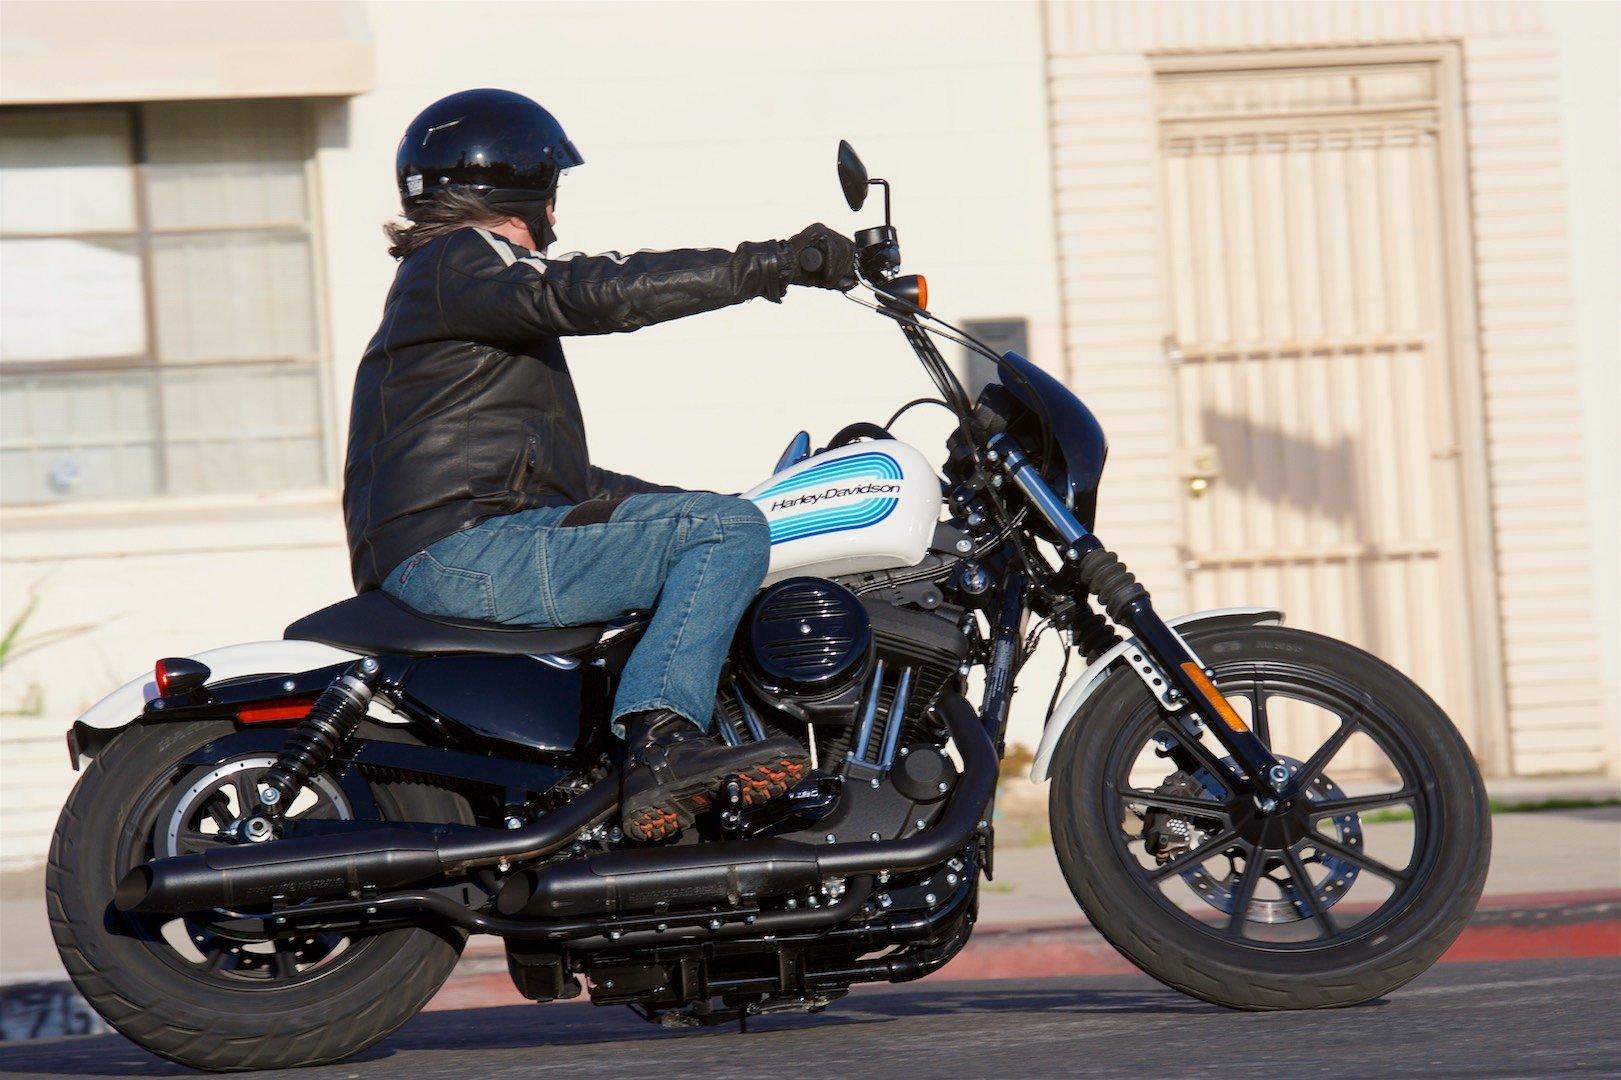 2018 Harley-Davidson Iron 1200 colors